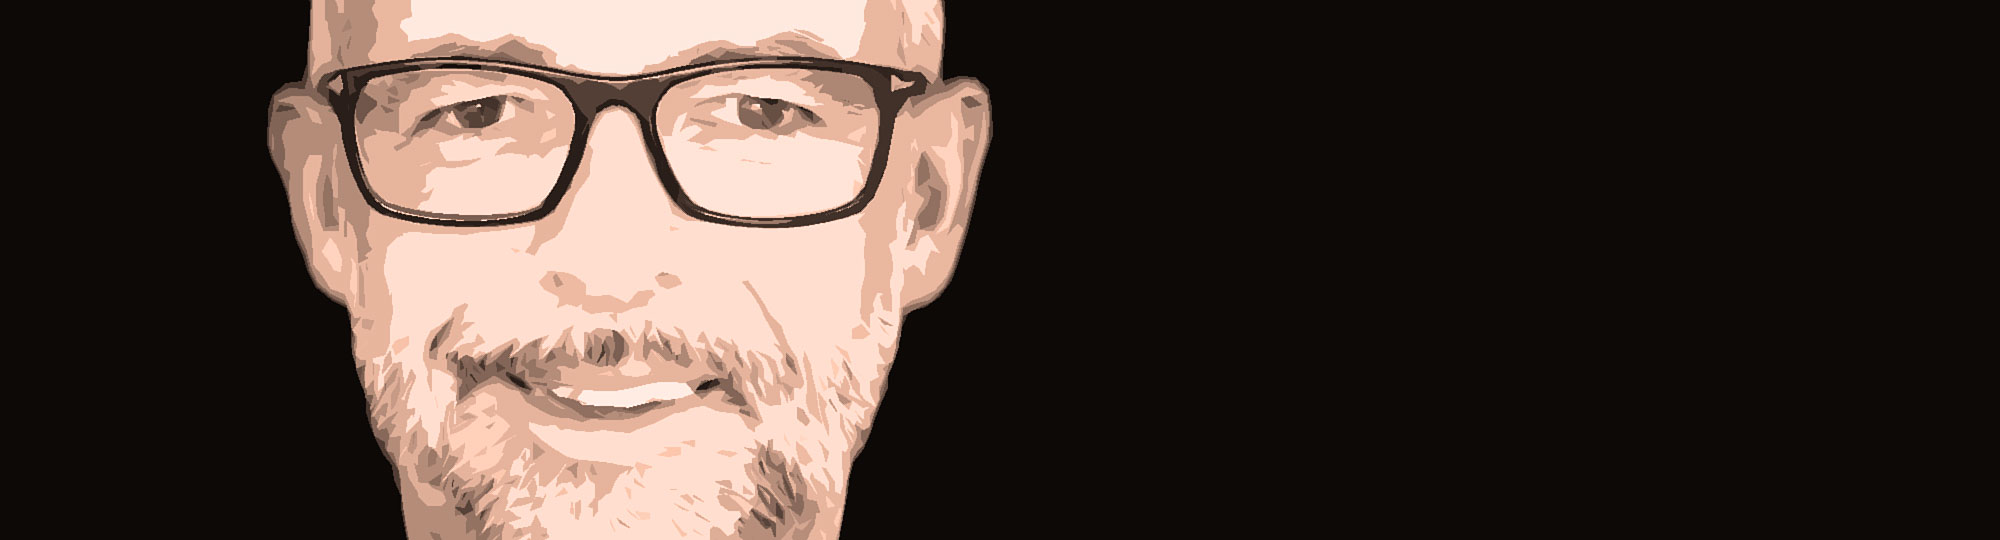 Experte Manfred Michèl Heros über Purpose Management